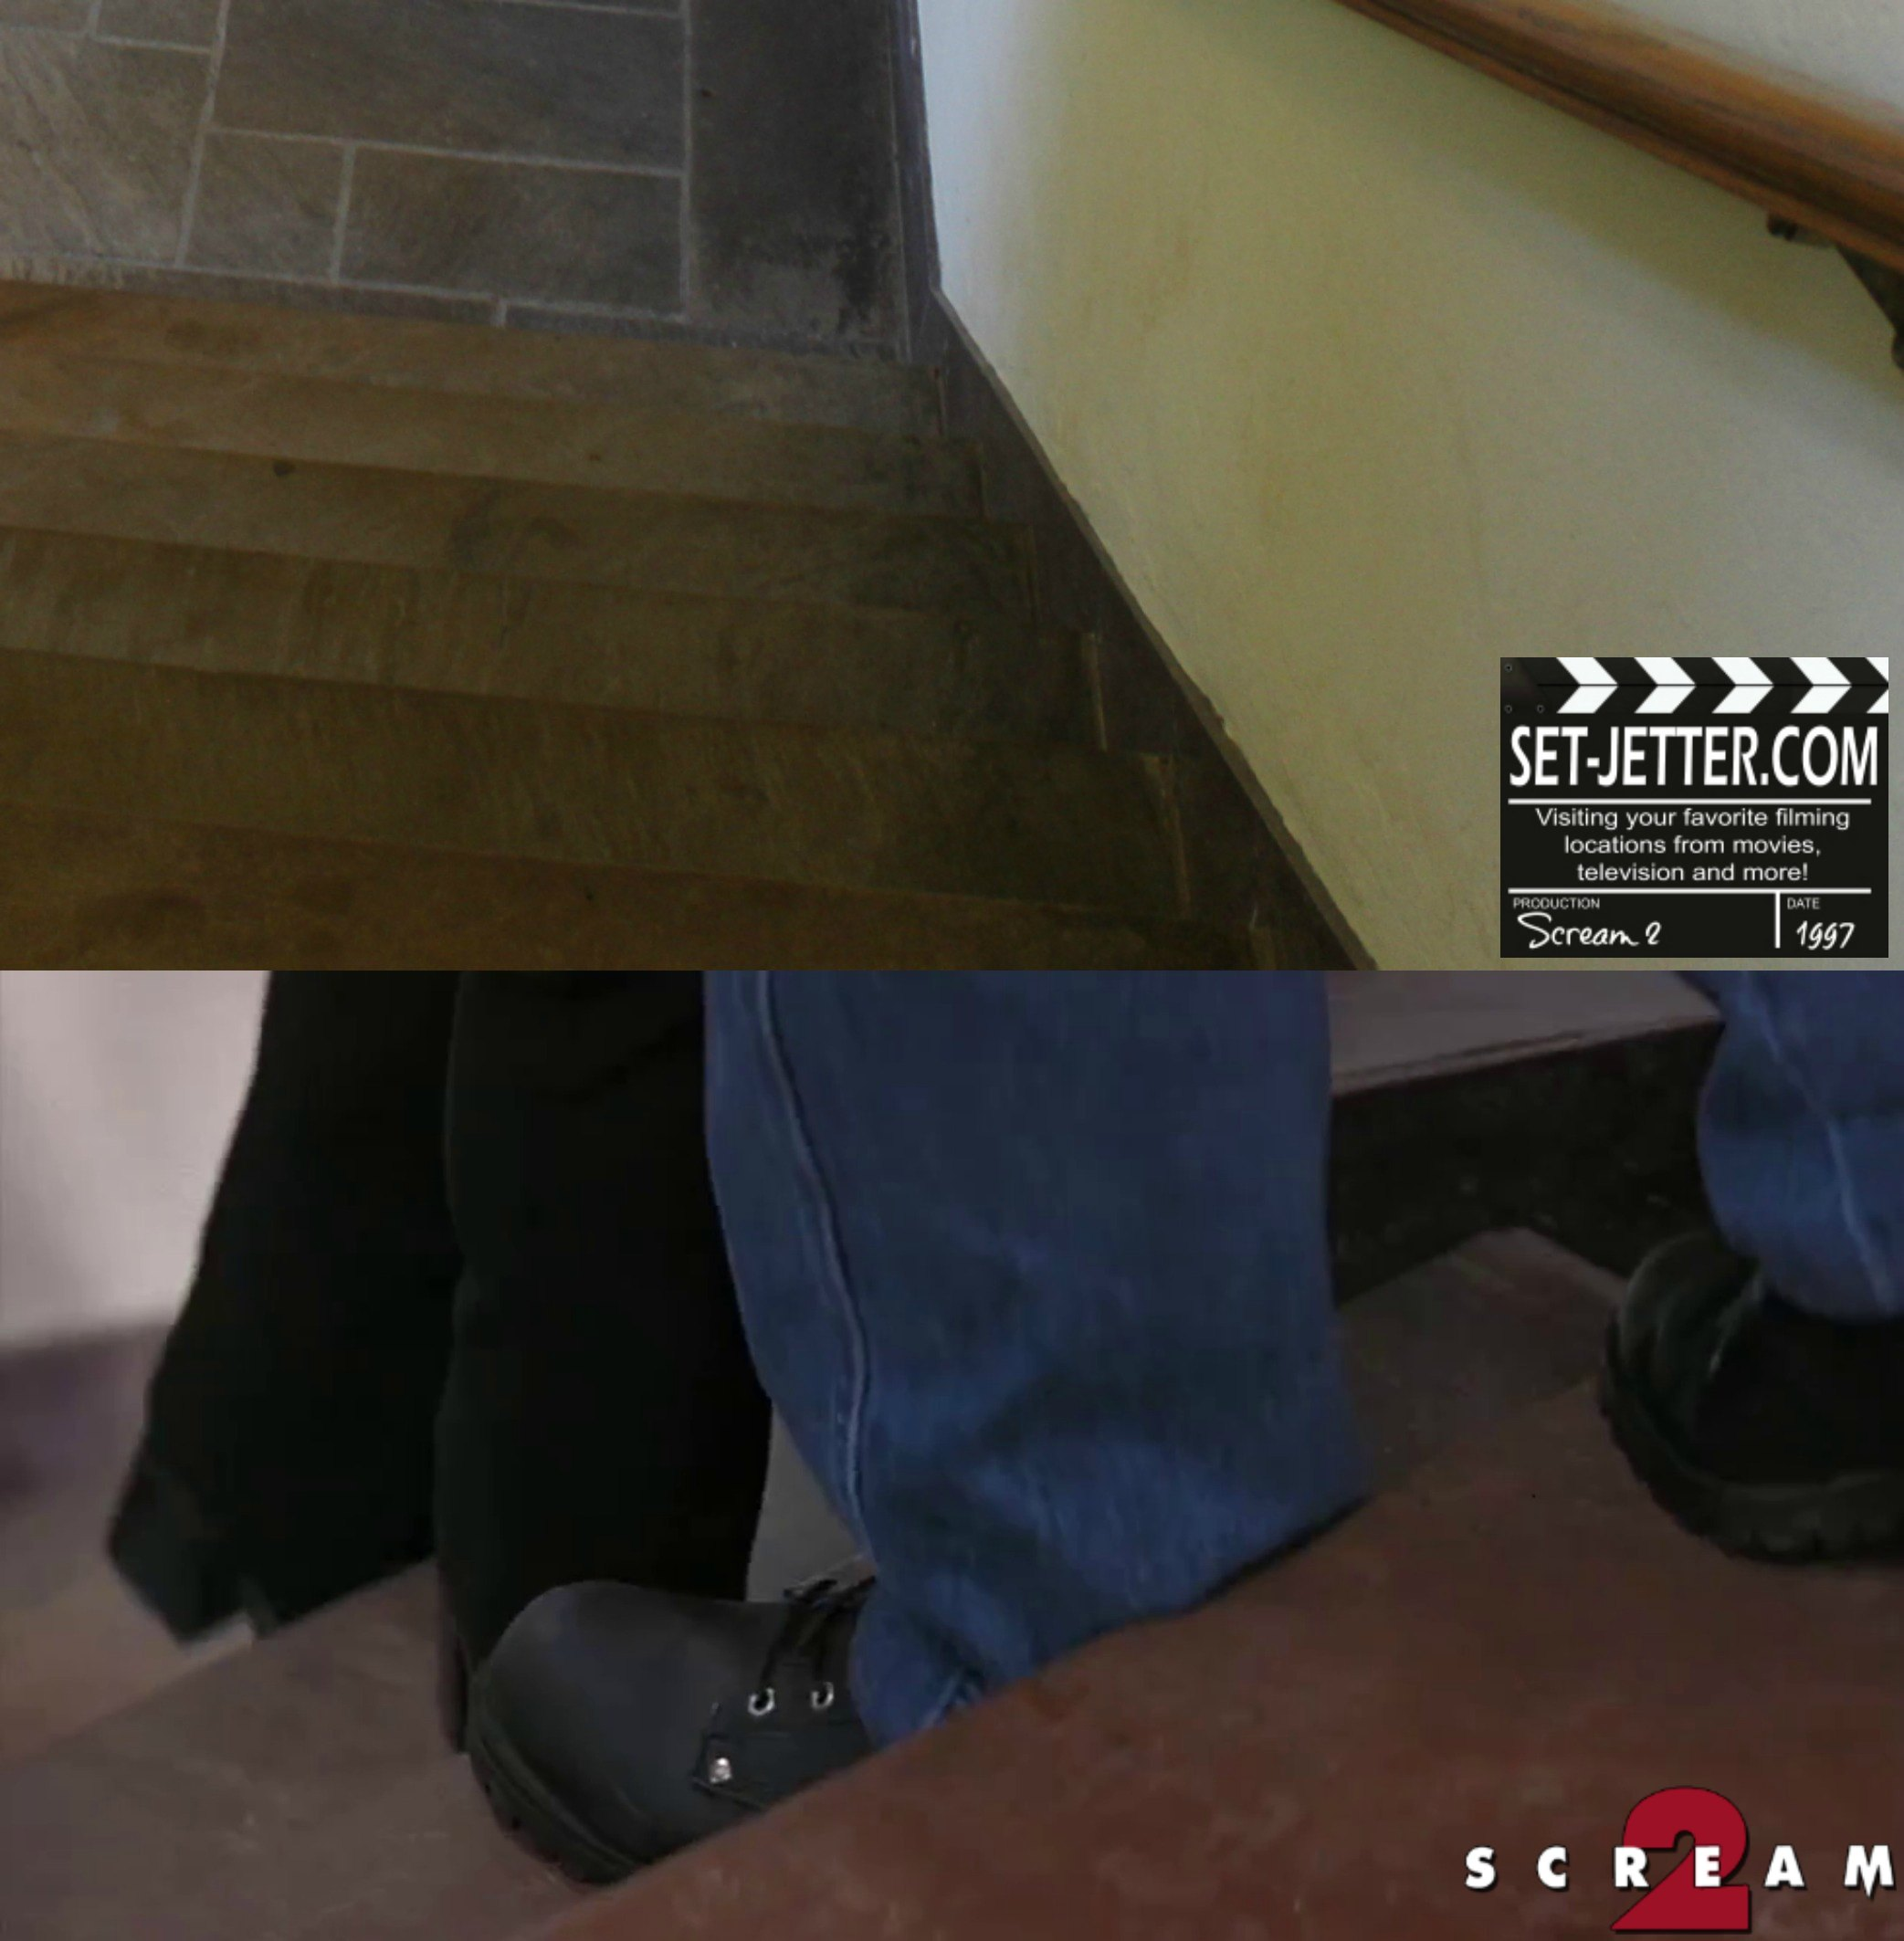 Scream 2 comparison 191.jpg